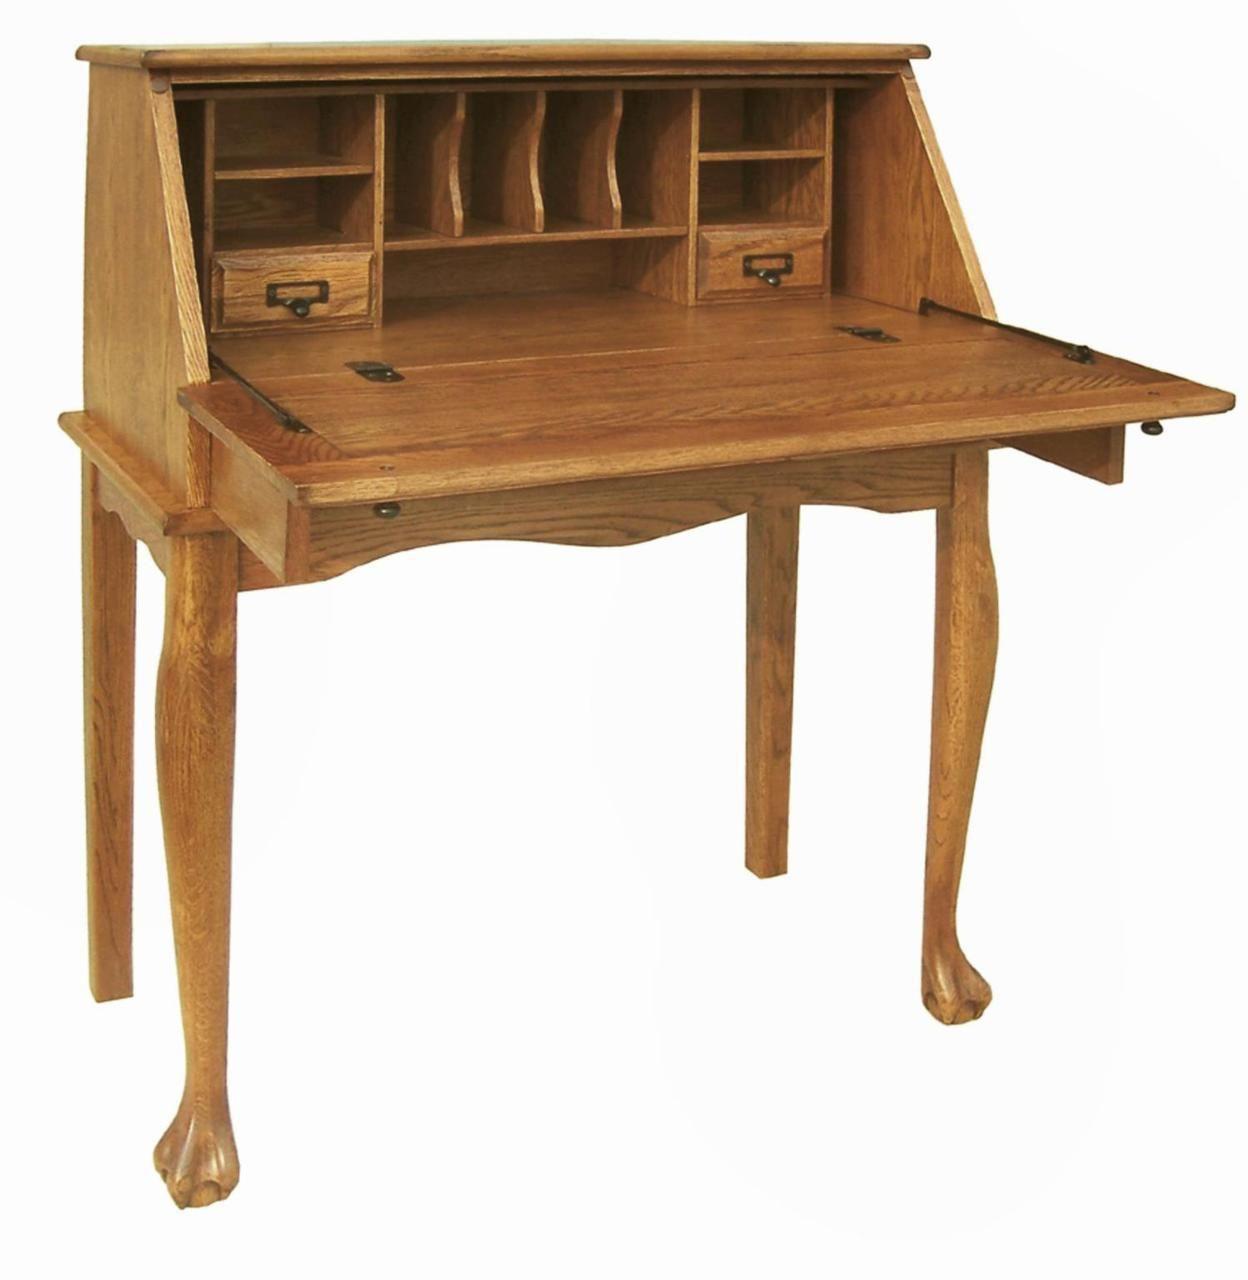 Secretary desk furniture plans - 32 Solid Oak Secretary Drop Down Desk Solid Wood Furniturefurniture Planshome